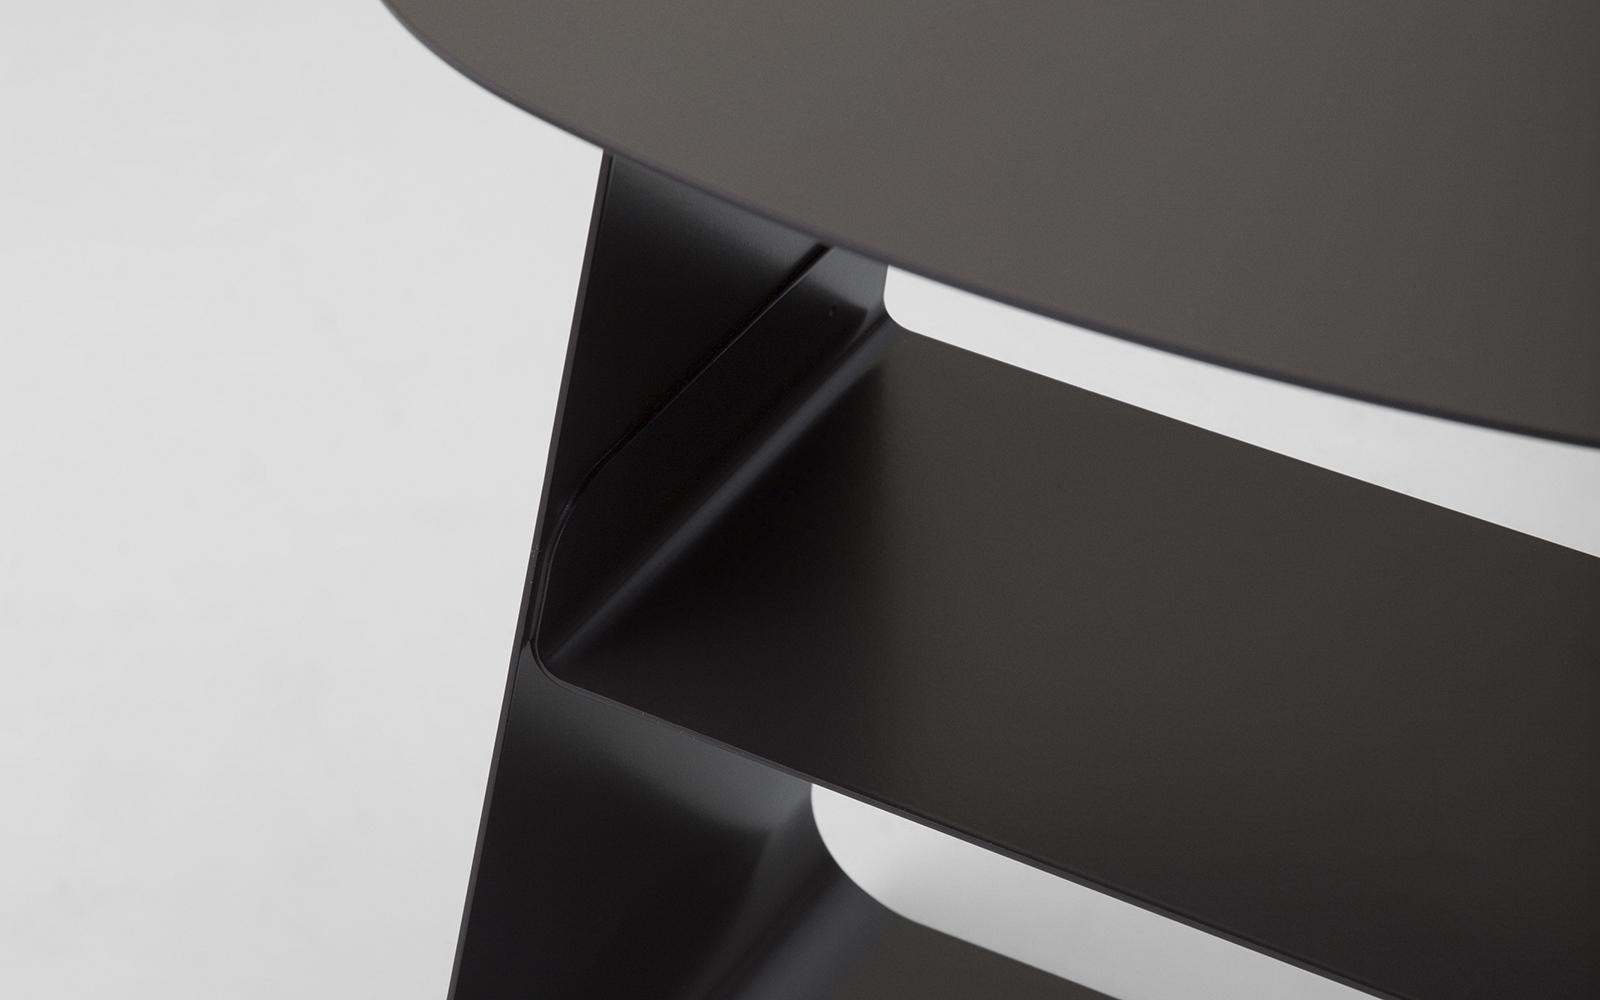 Stay | A minimalistic steel side table